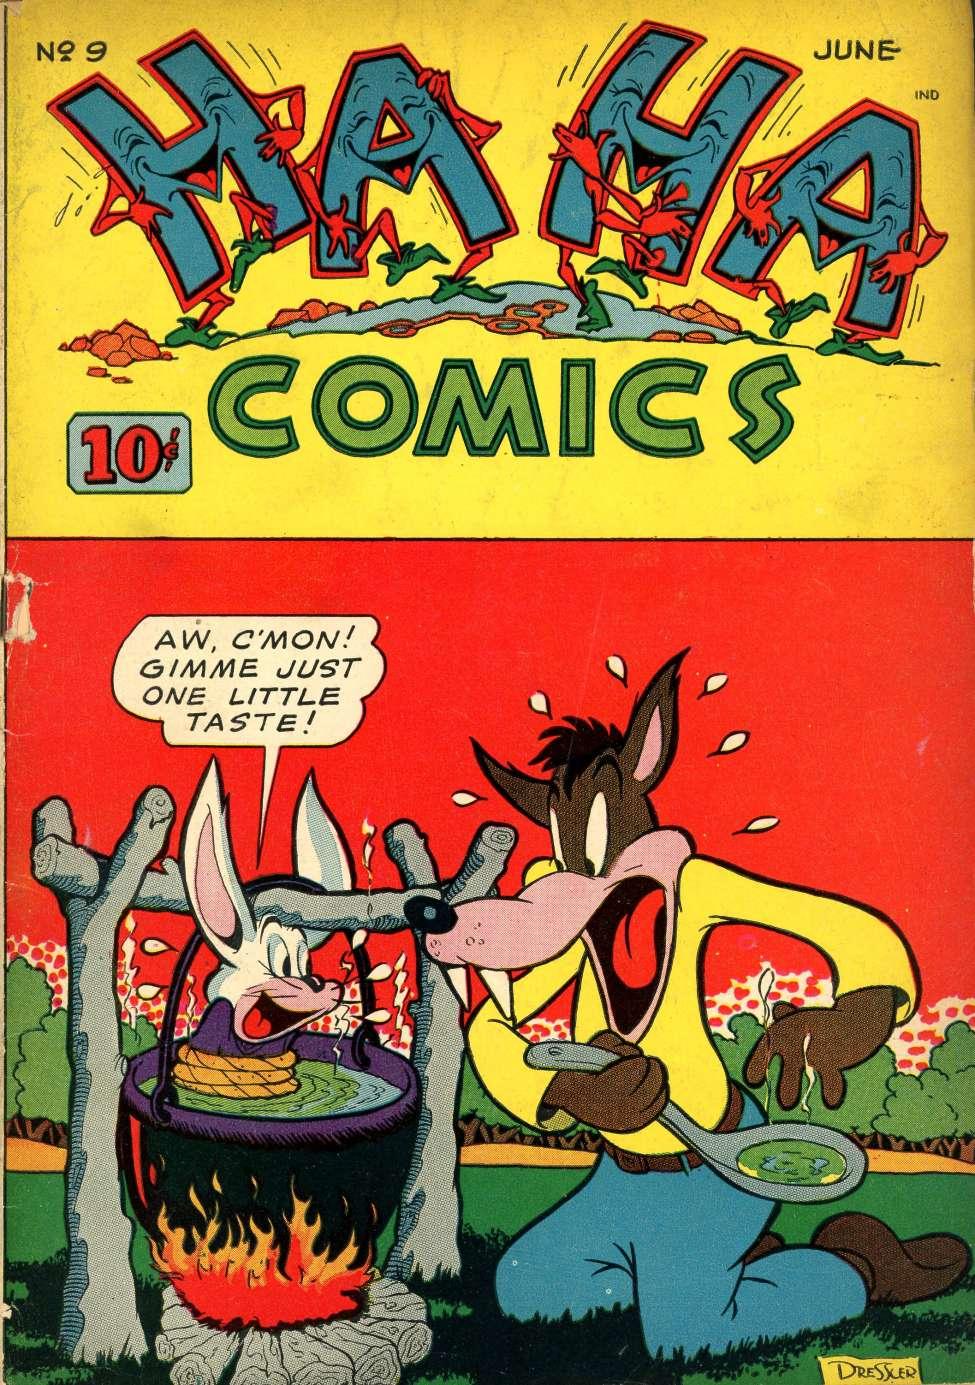 Comic Book Cover For Ha Ha Comics #9